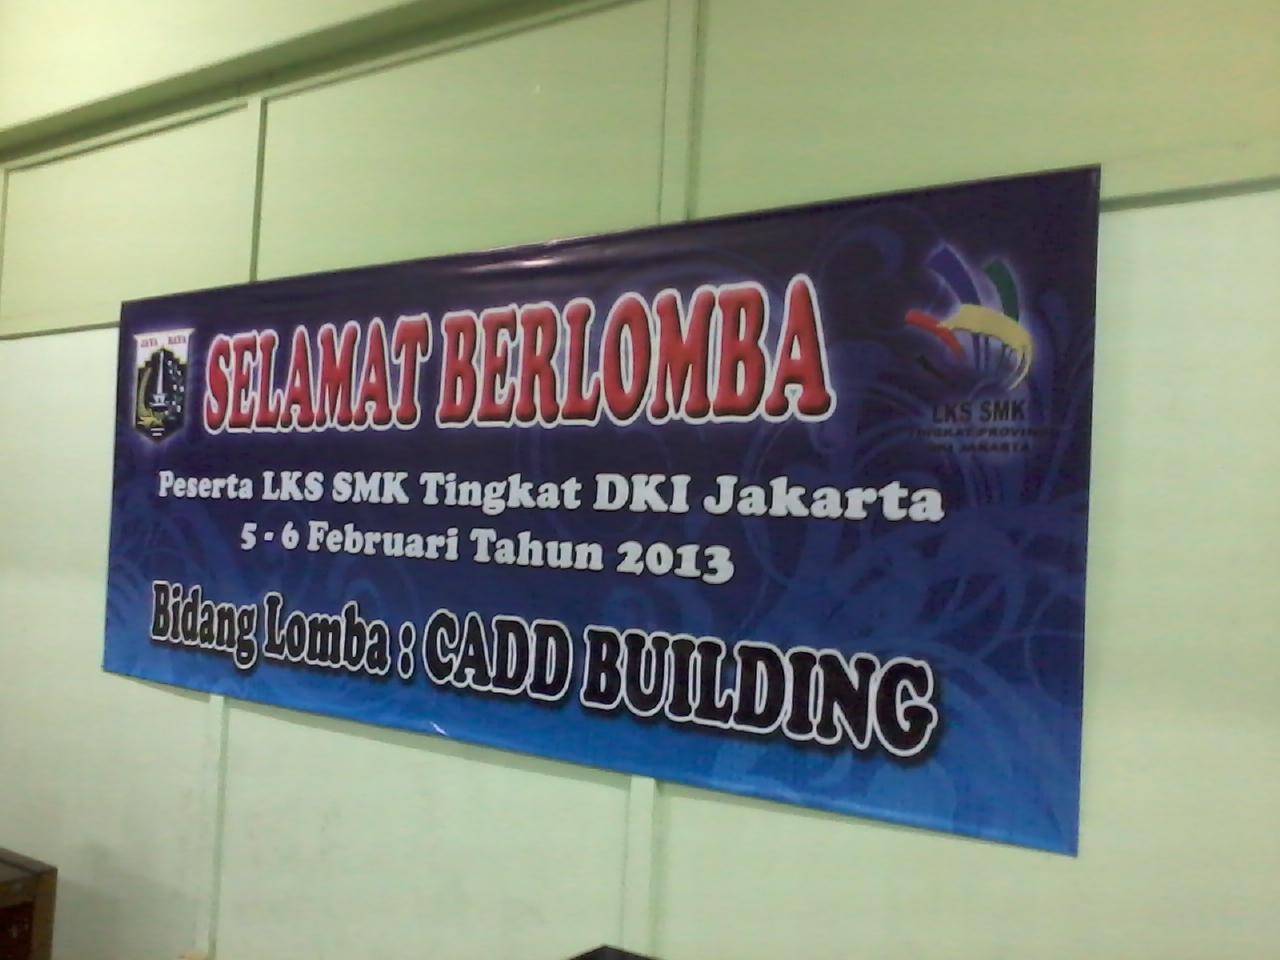 LKS SMK DKI JAKARTA - CADD BUILDING 2013